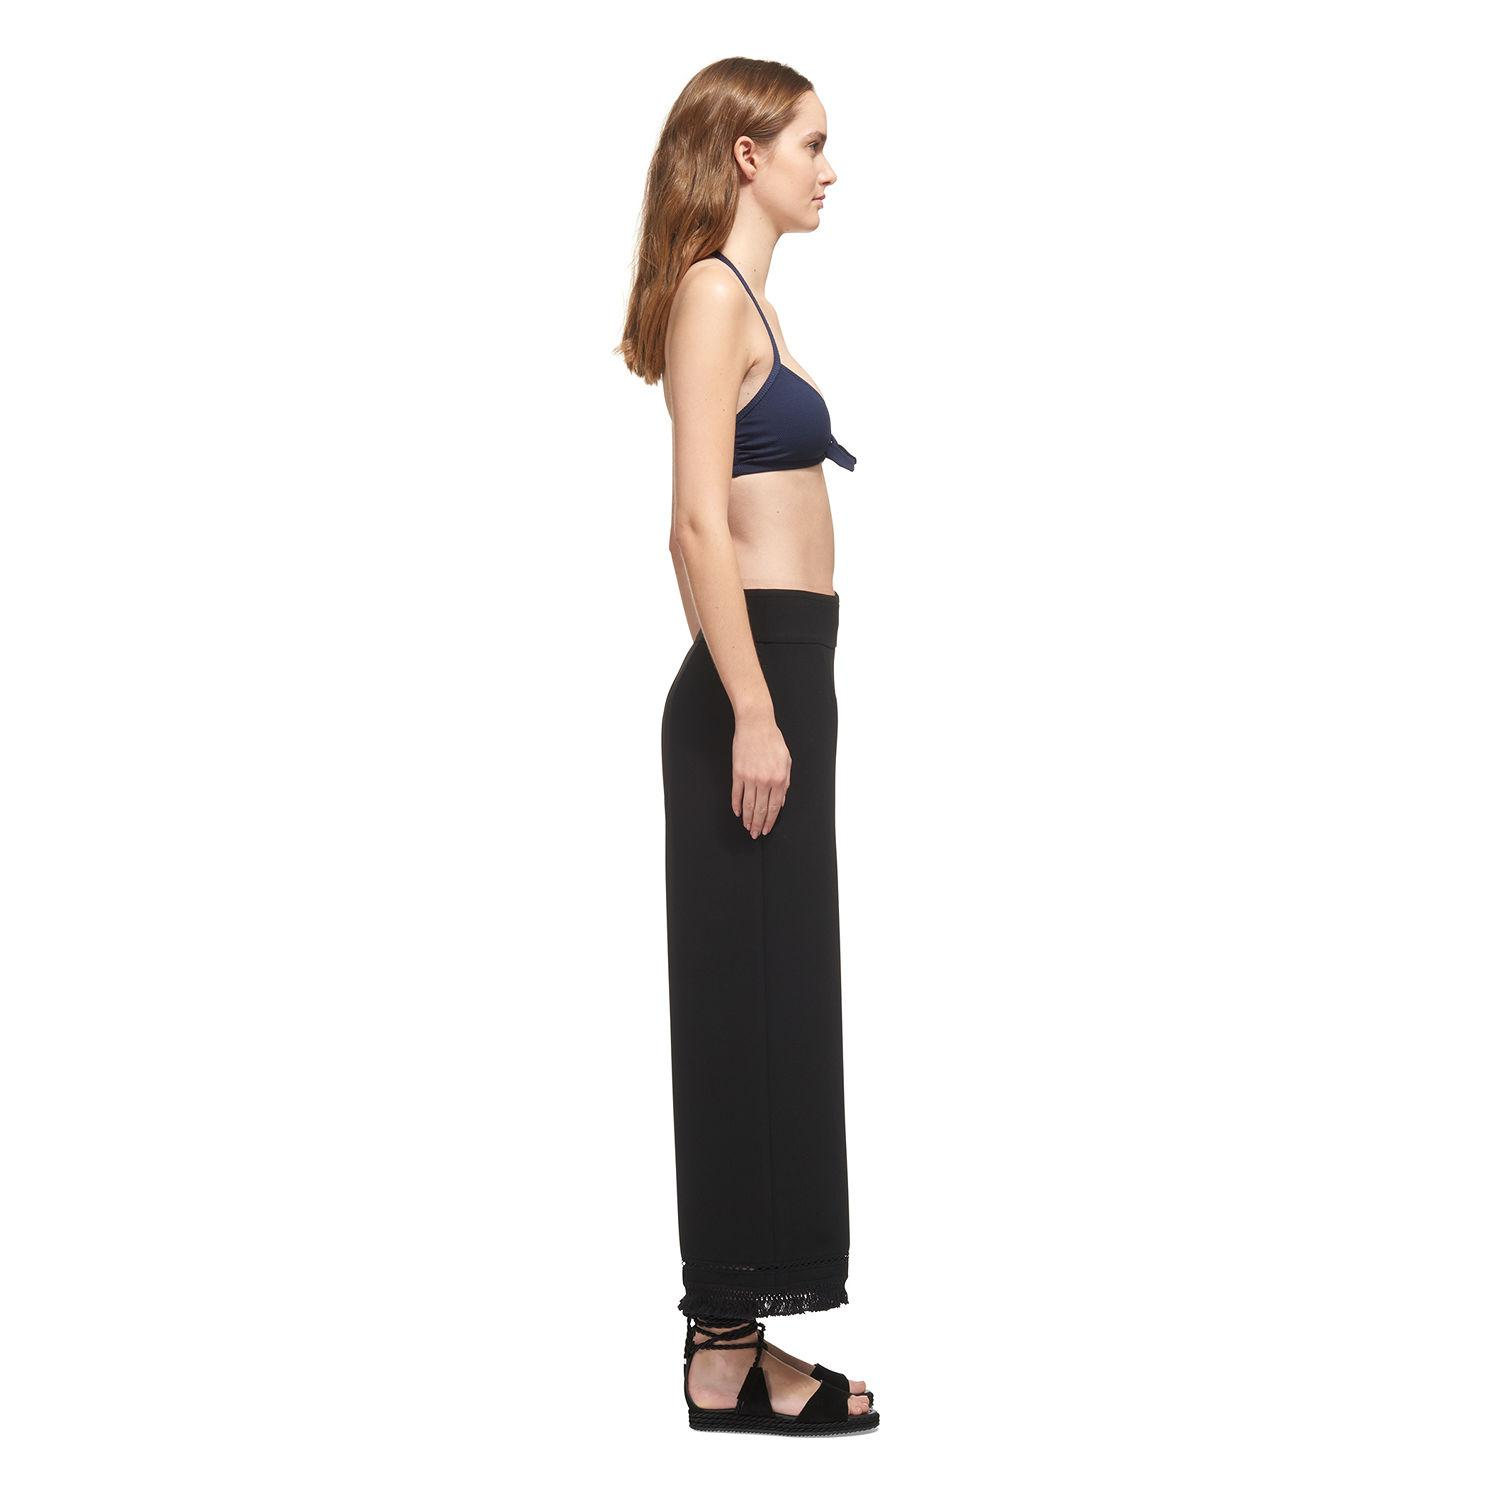 b320cd987f82b Lyst - Whistles Carolina Tie Front Bikini Top in Blue - Save ...